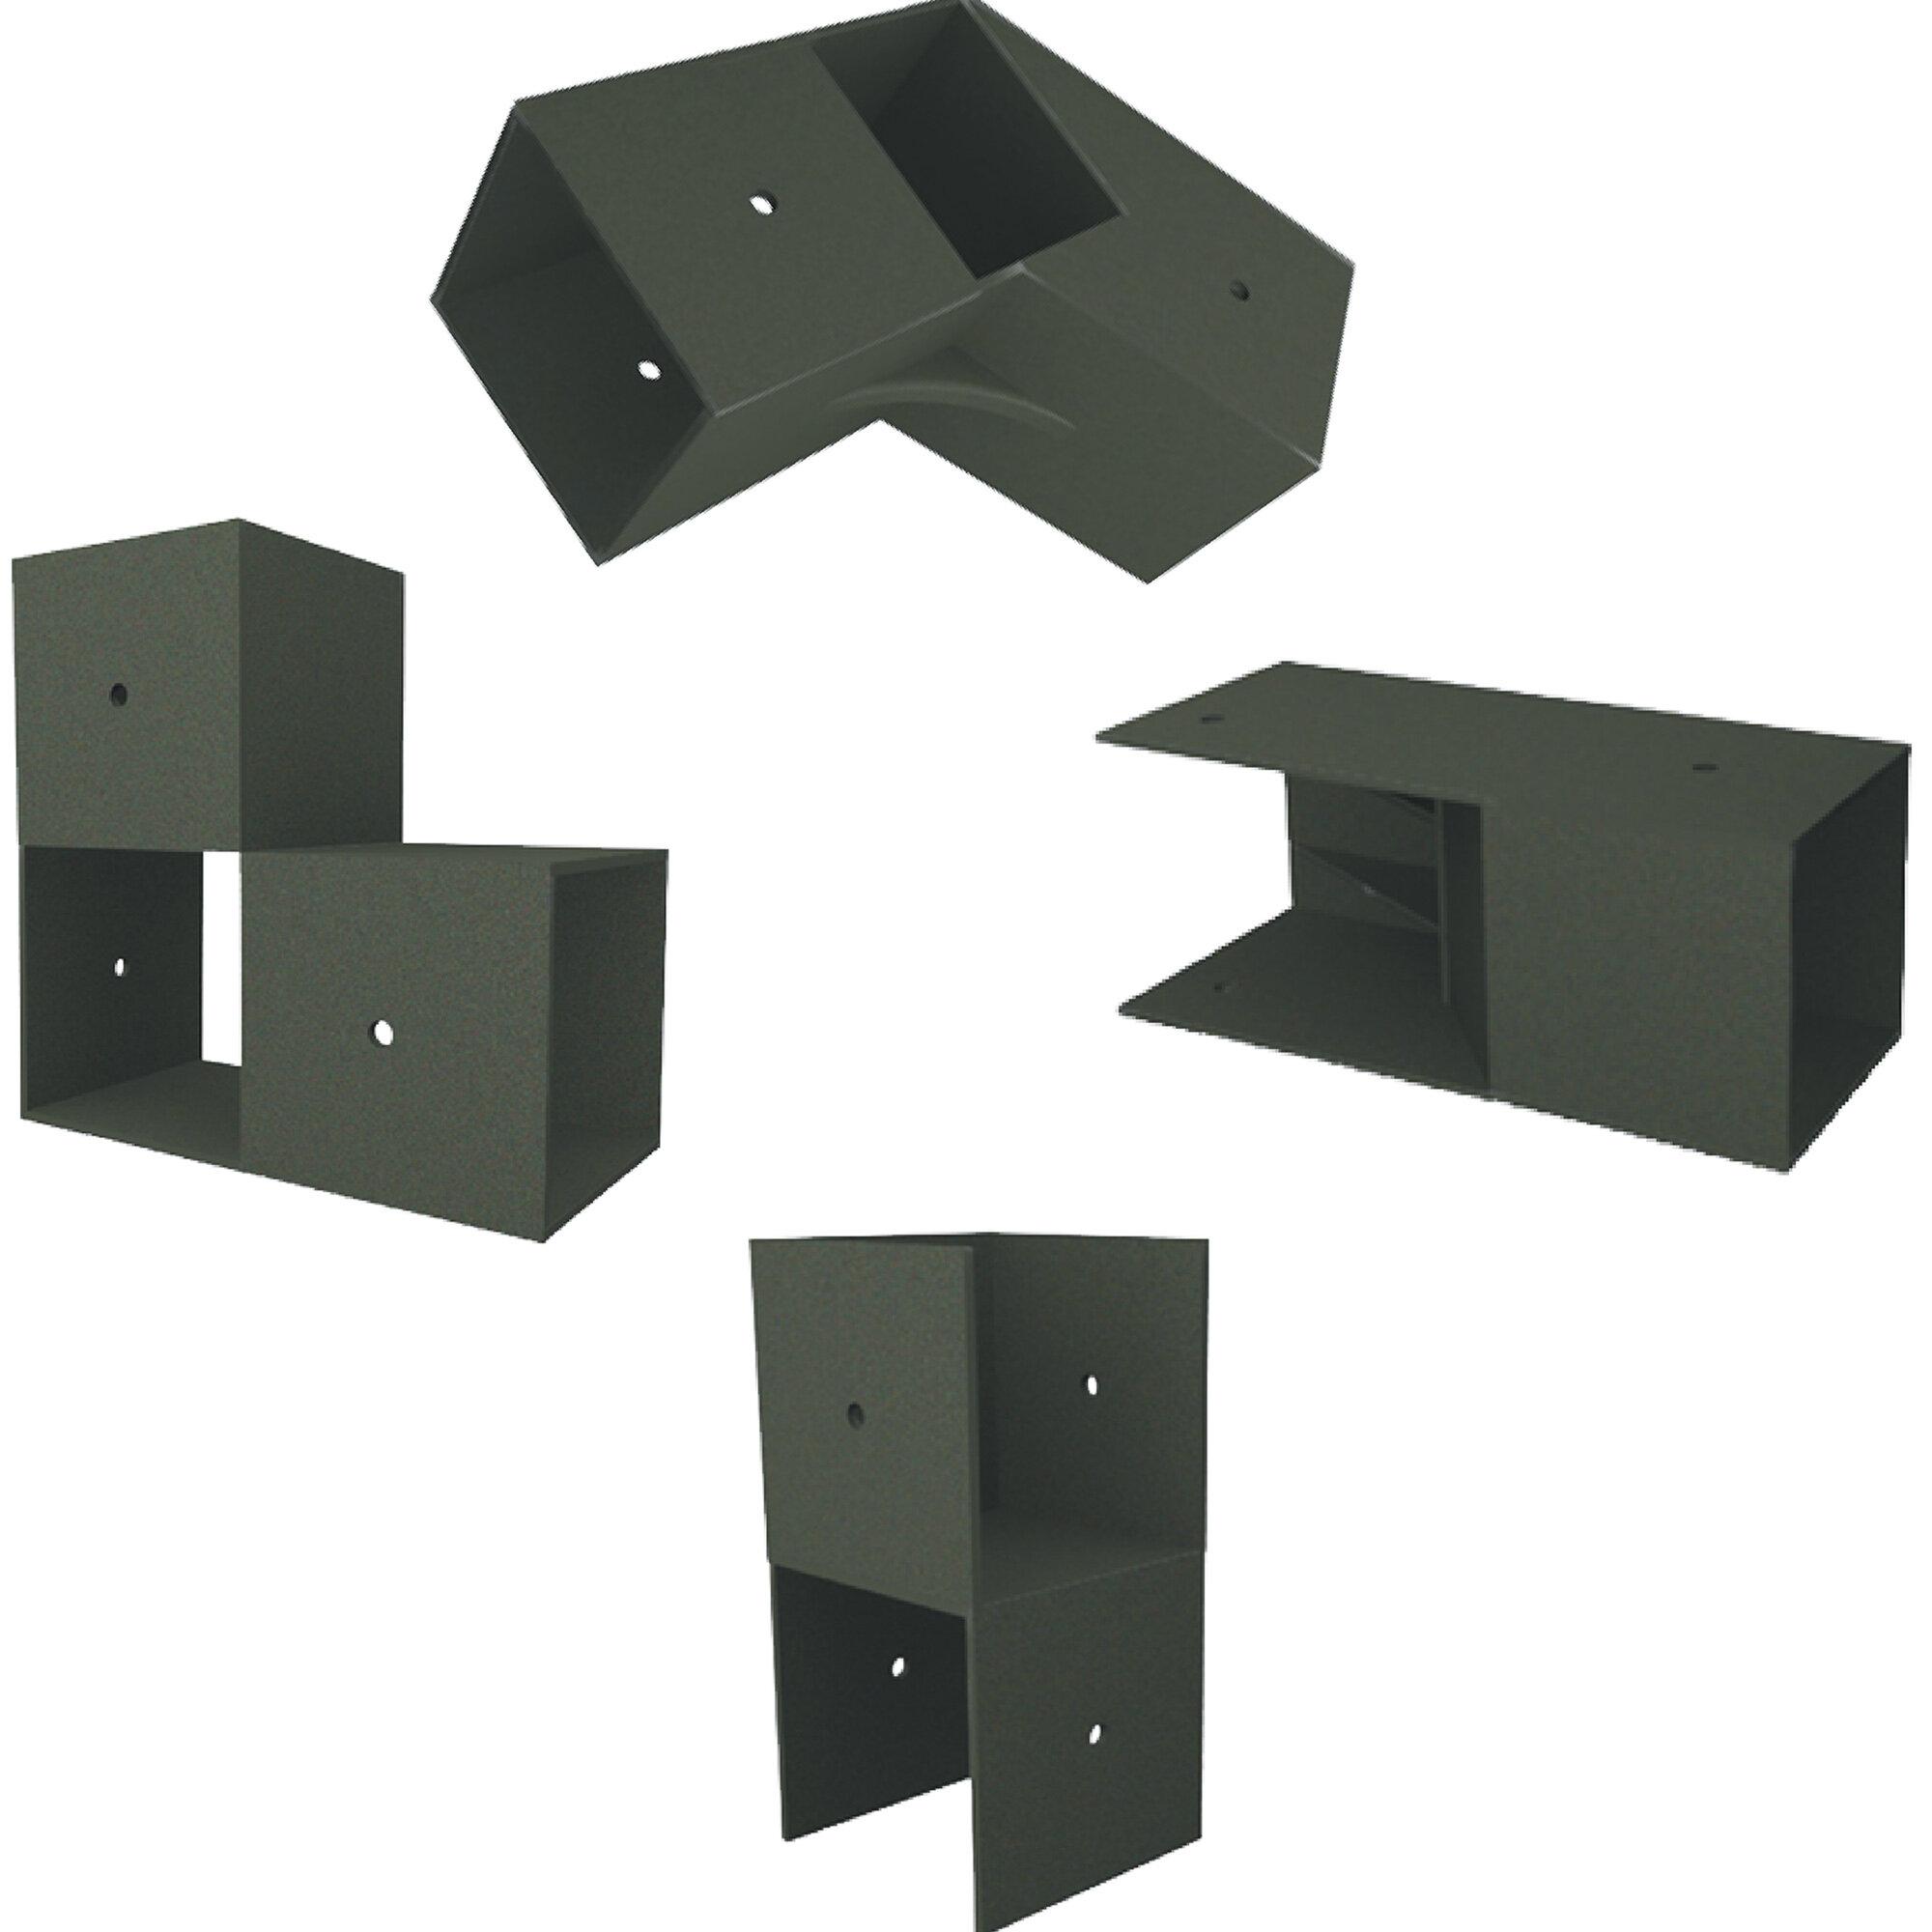 E Z Frames 10 Ft W X 14 Ft D Wood Storage Shed Wayfair